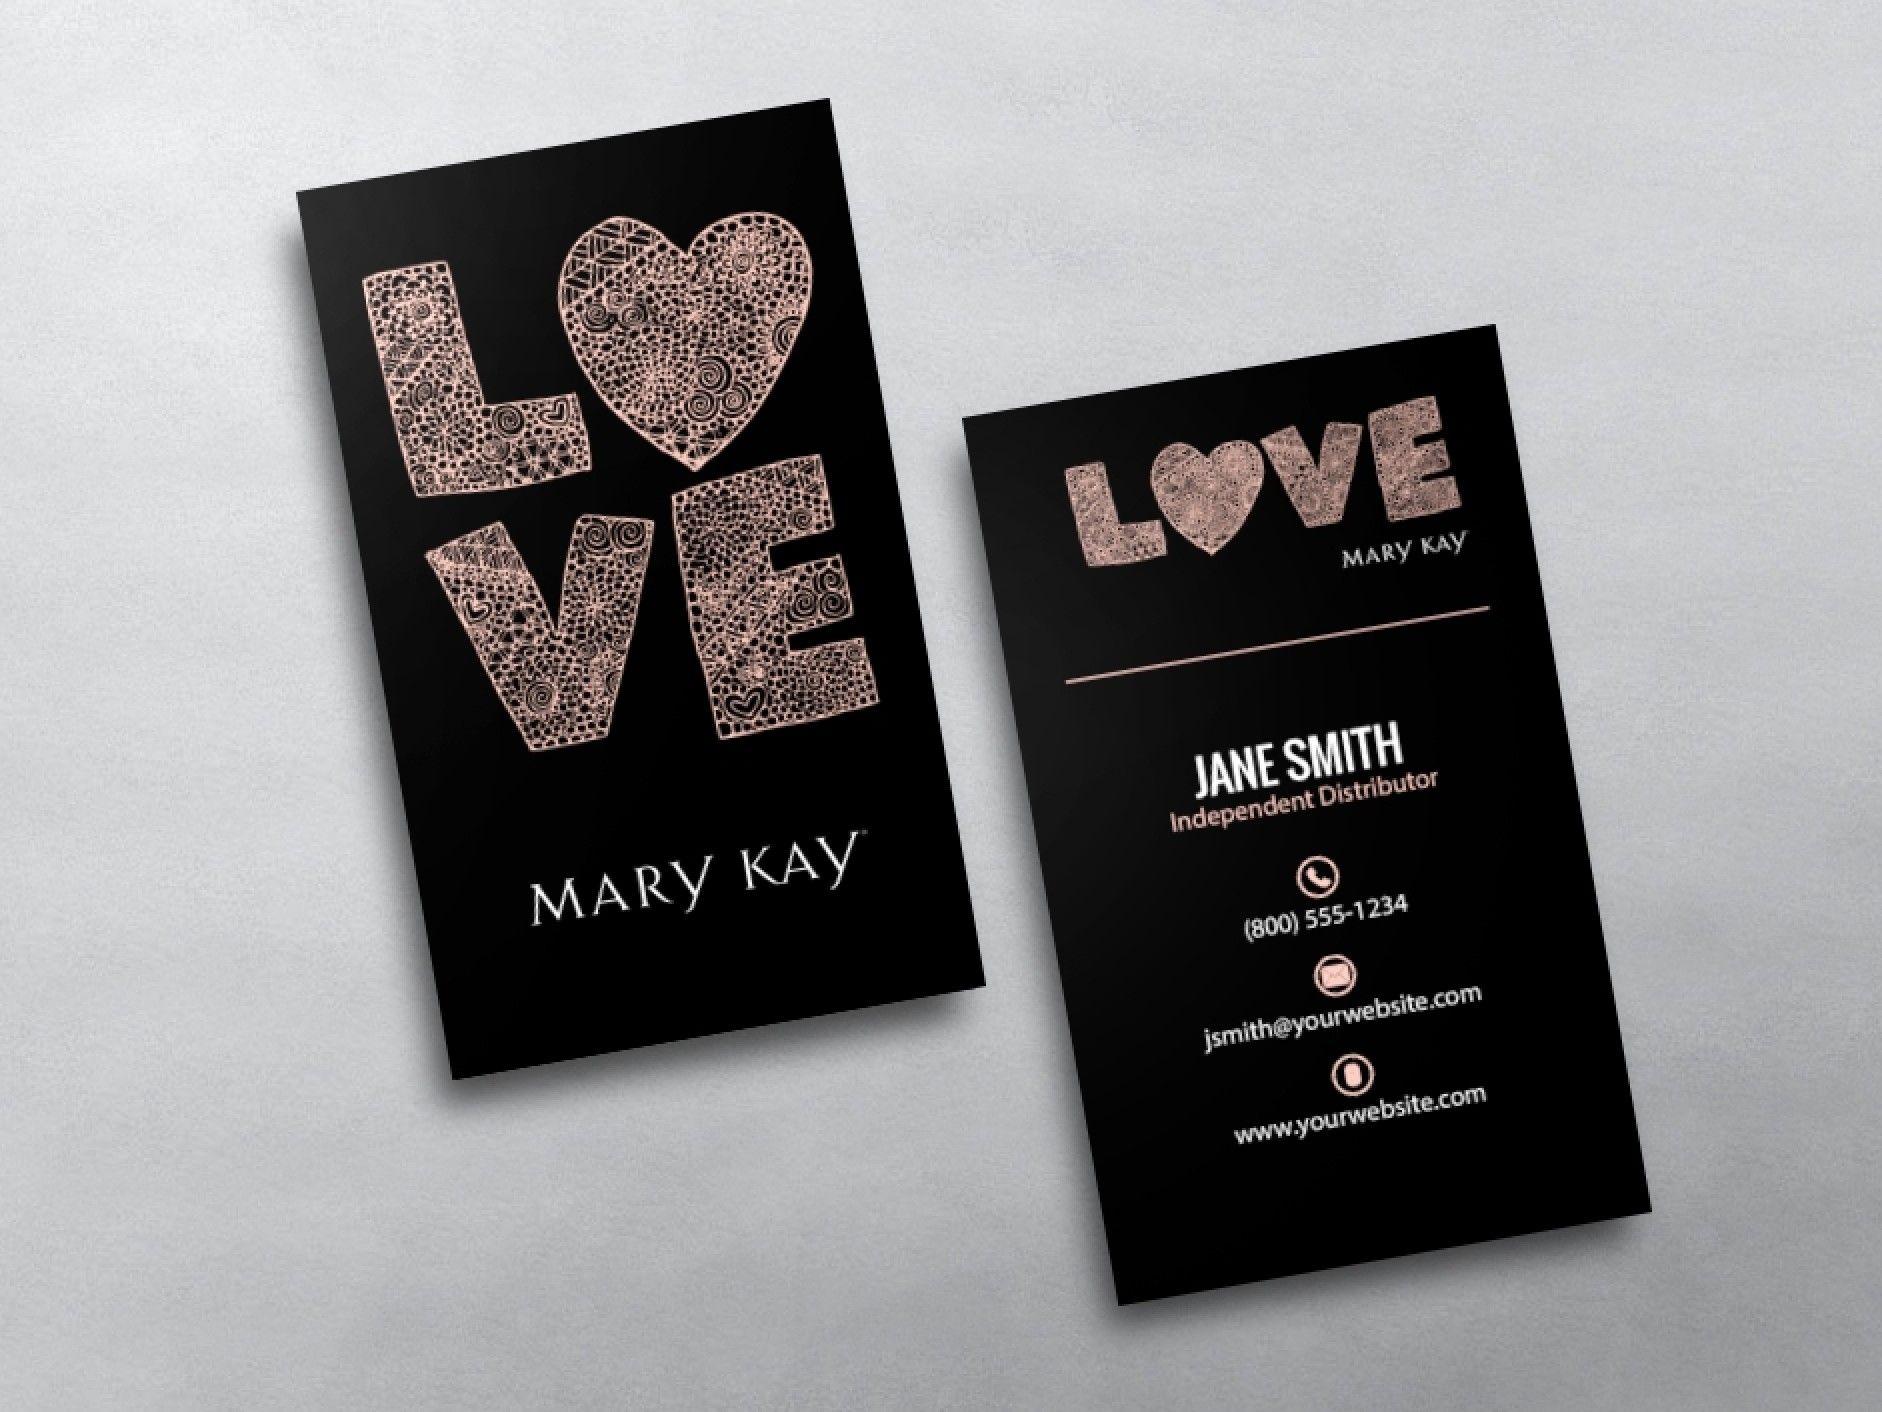 Mary Kay Business Cards | Mary Kay | Pinterest | Mary Kay, Free - Free Printable Mary Kay Business Cards